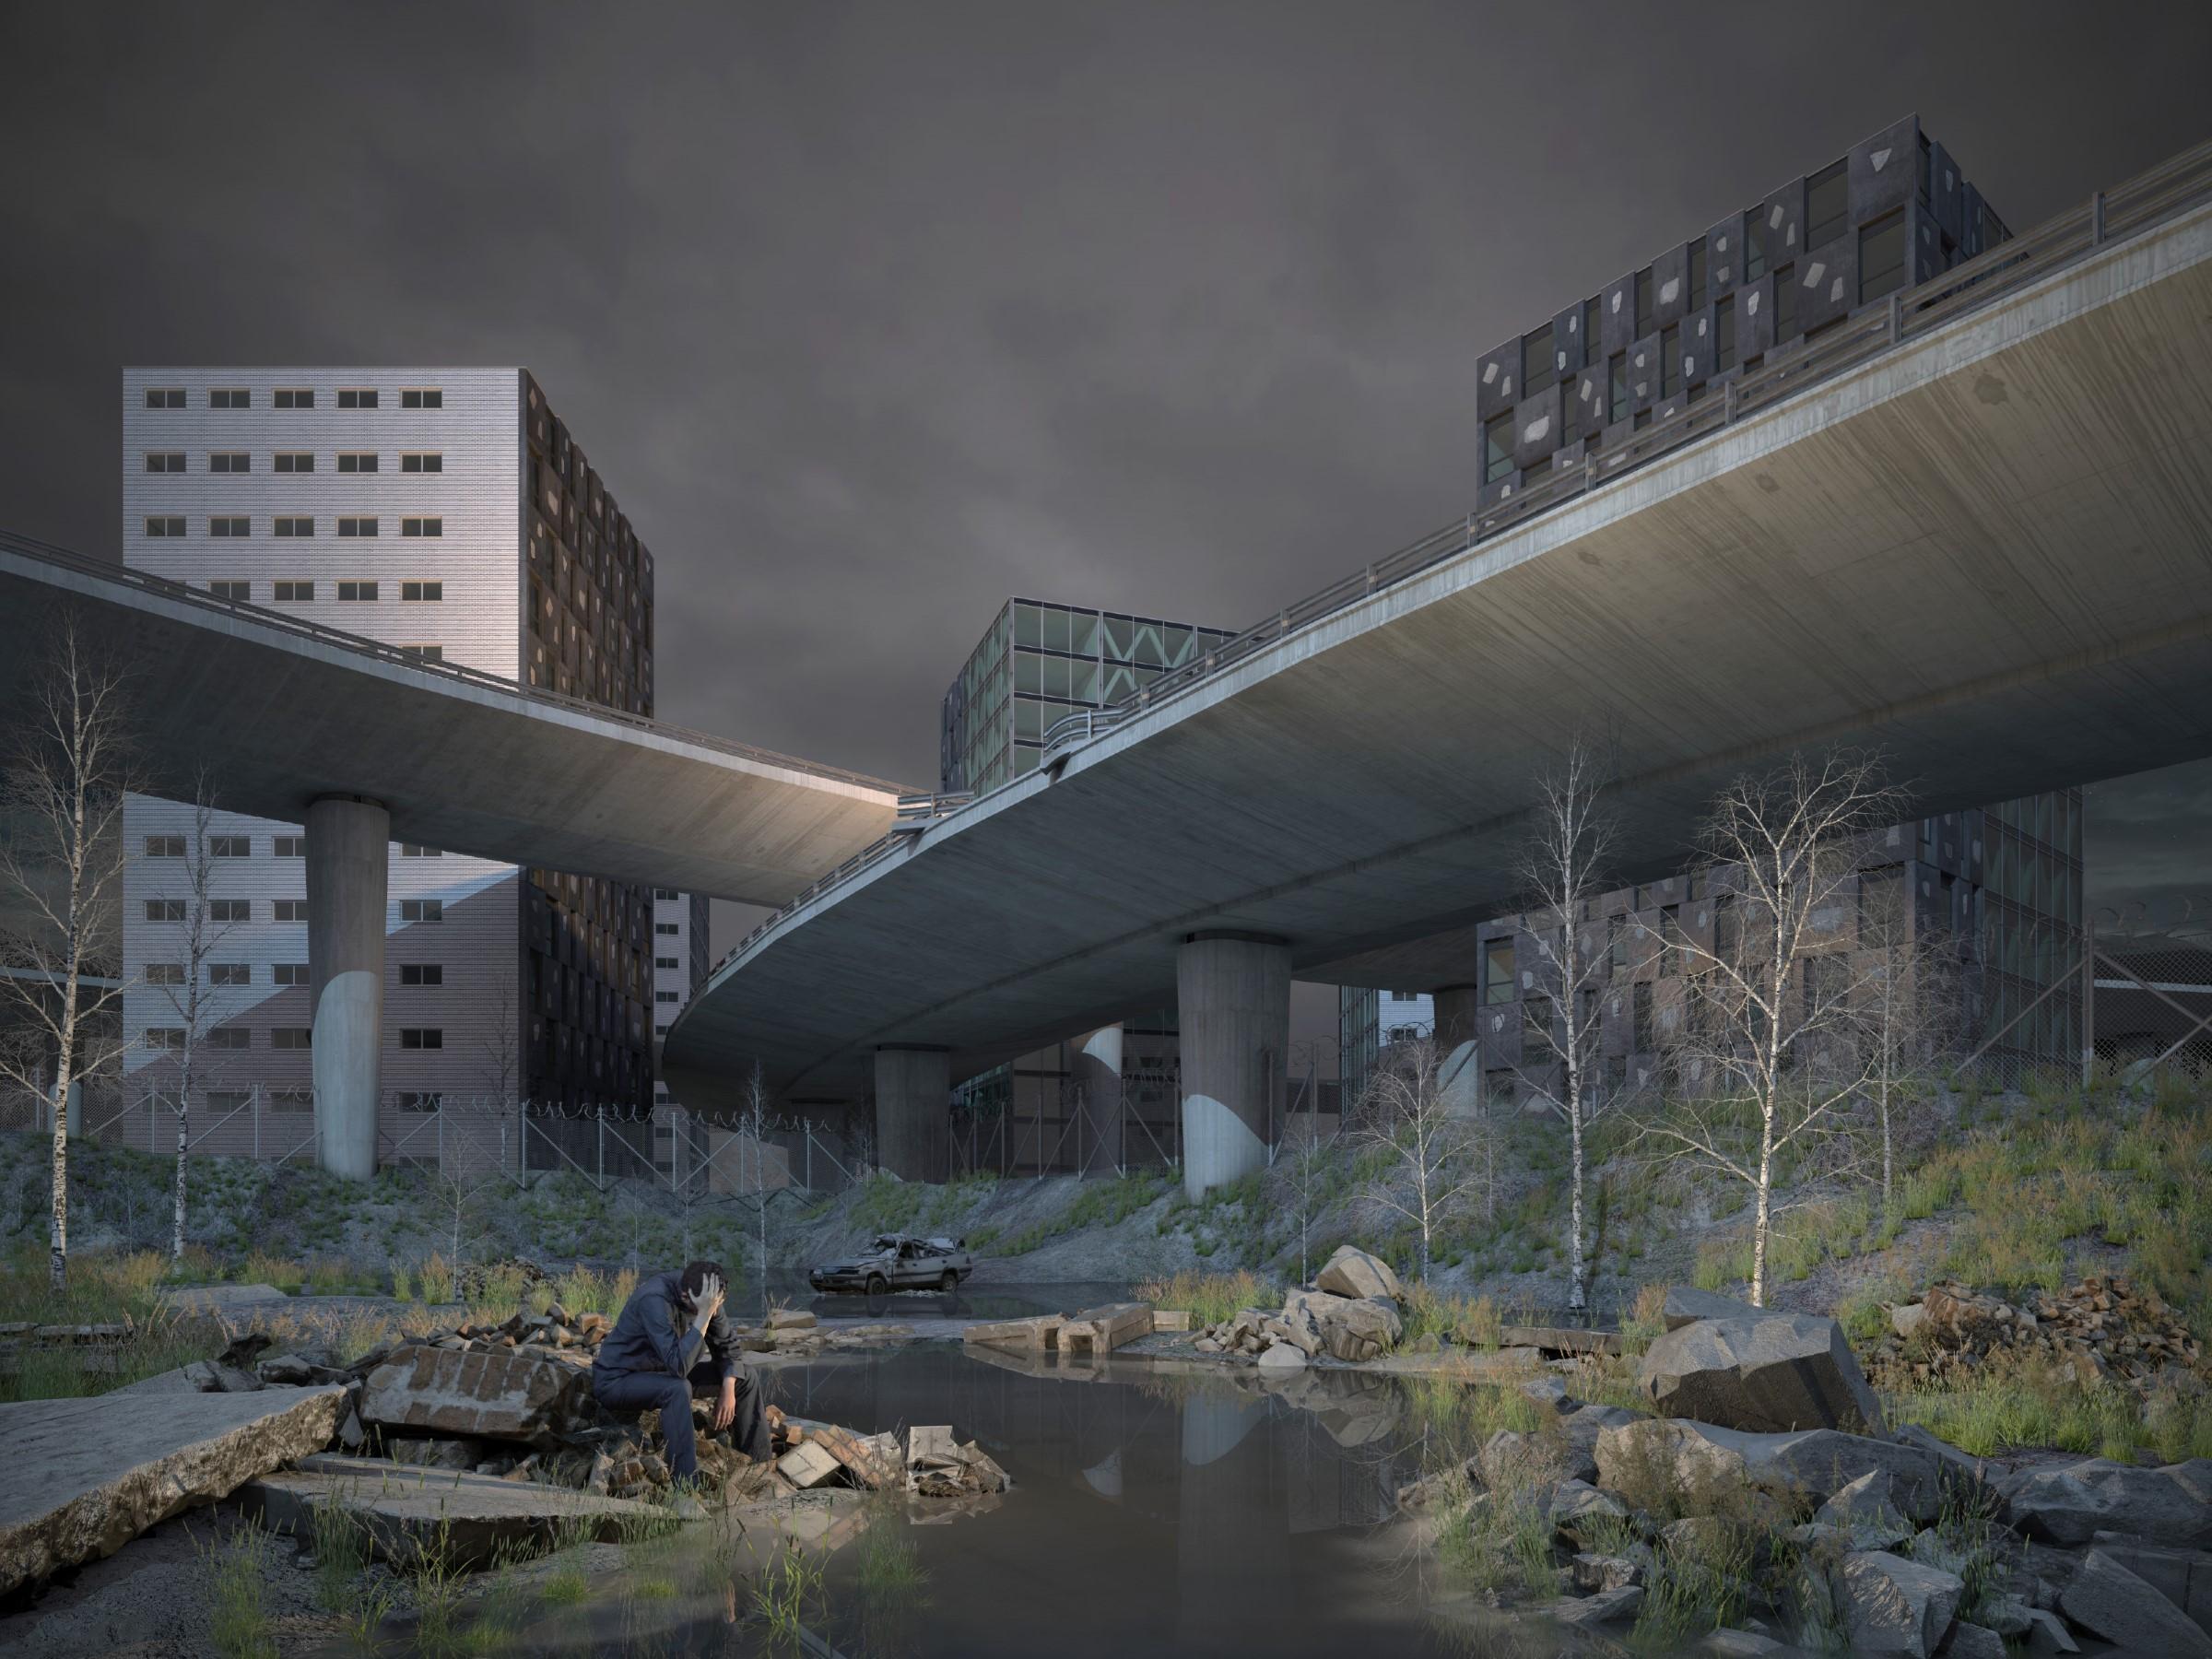 concrete island, 2018 (160cmx120cm) dibond